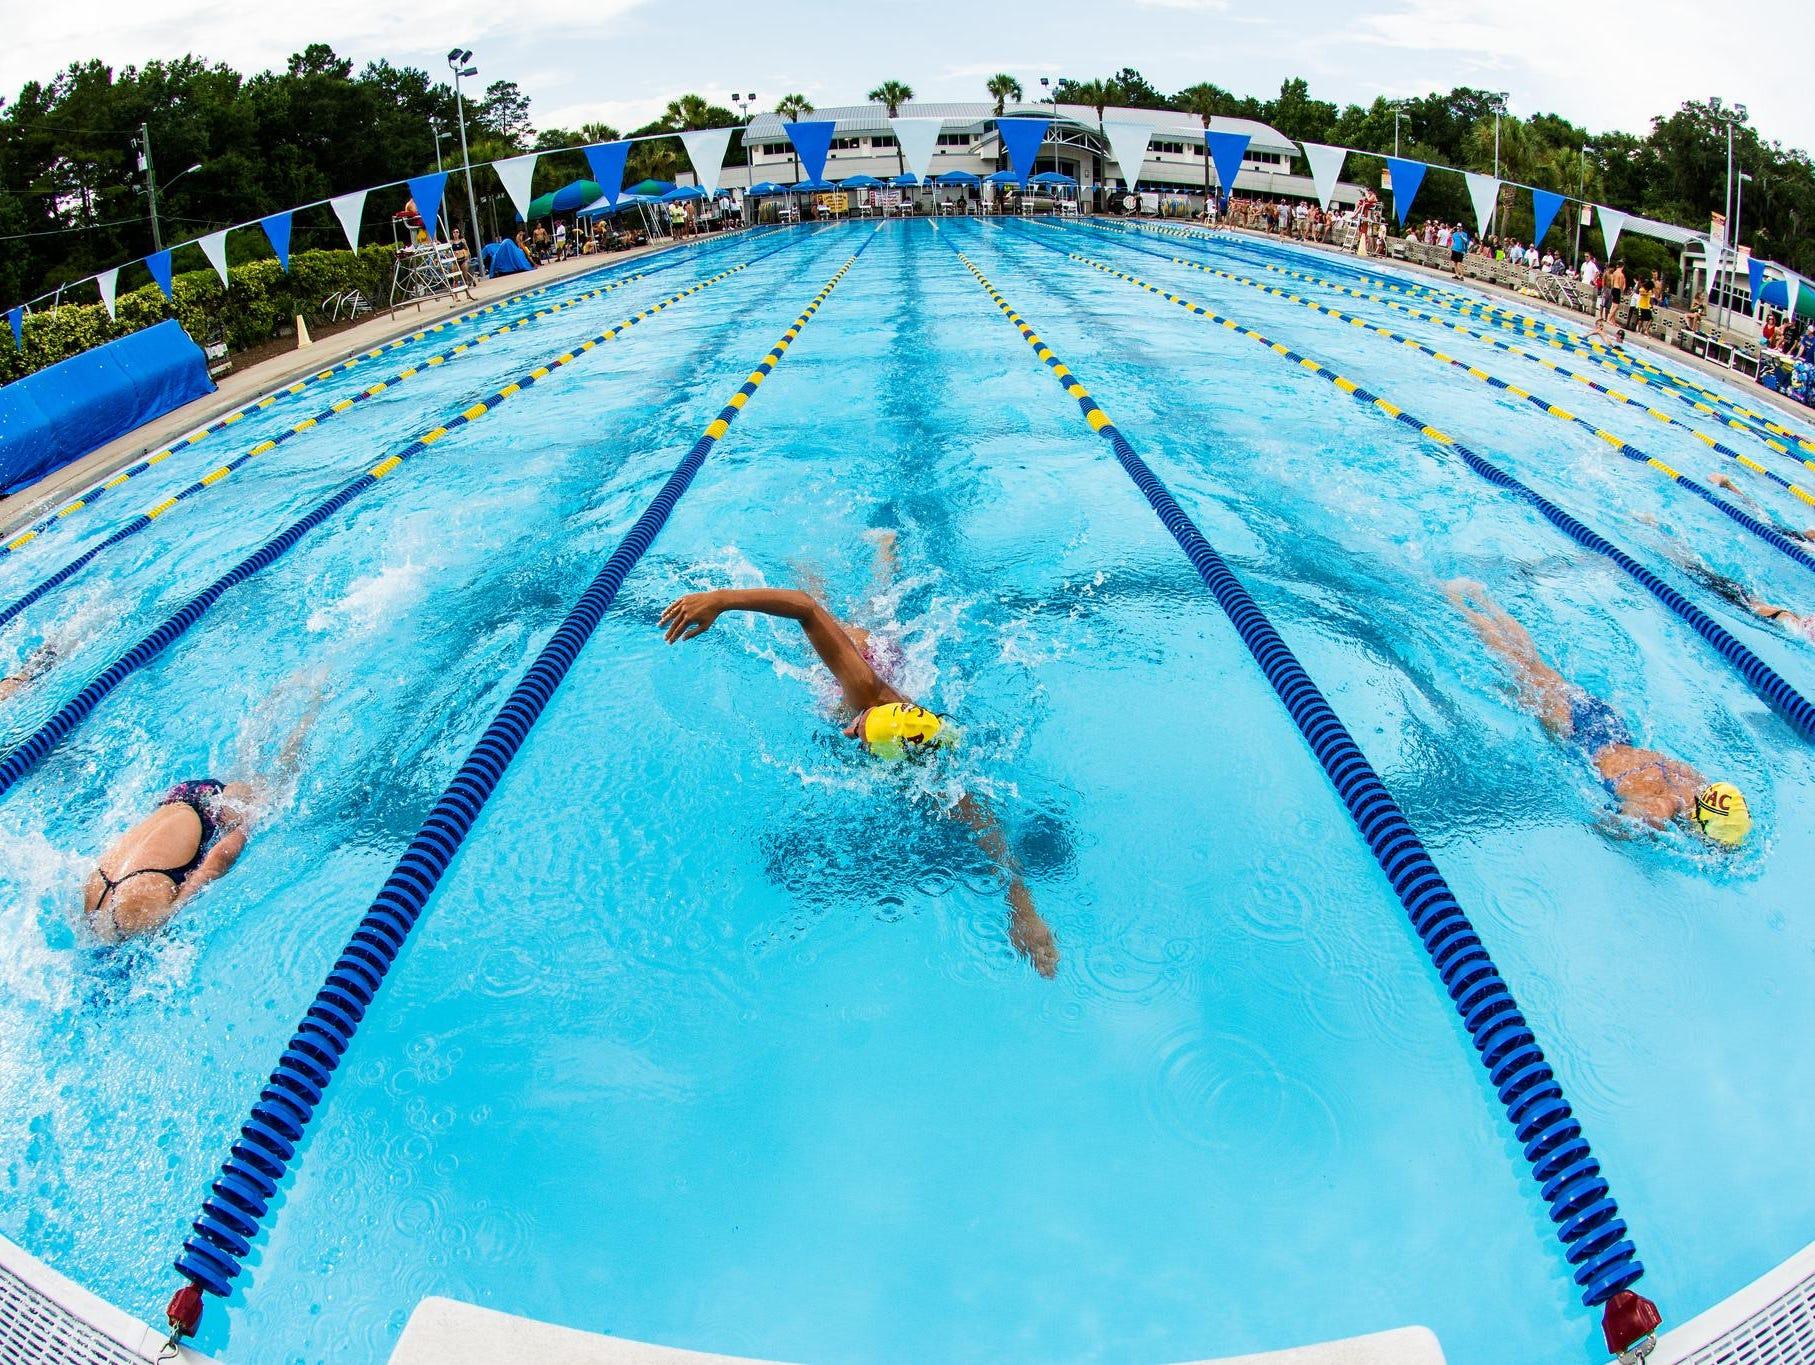 Lincoln junior Sara-Kellett Clark swims during ATAC's Long Course Invitational over the summer.